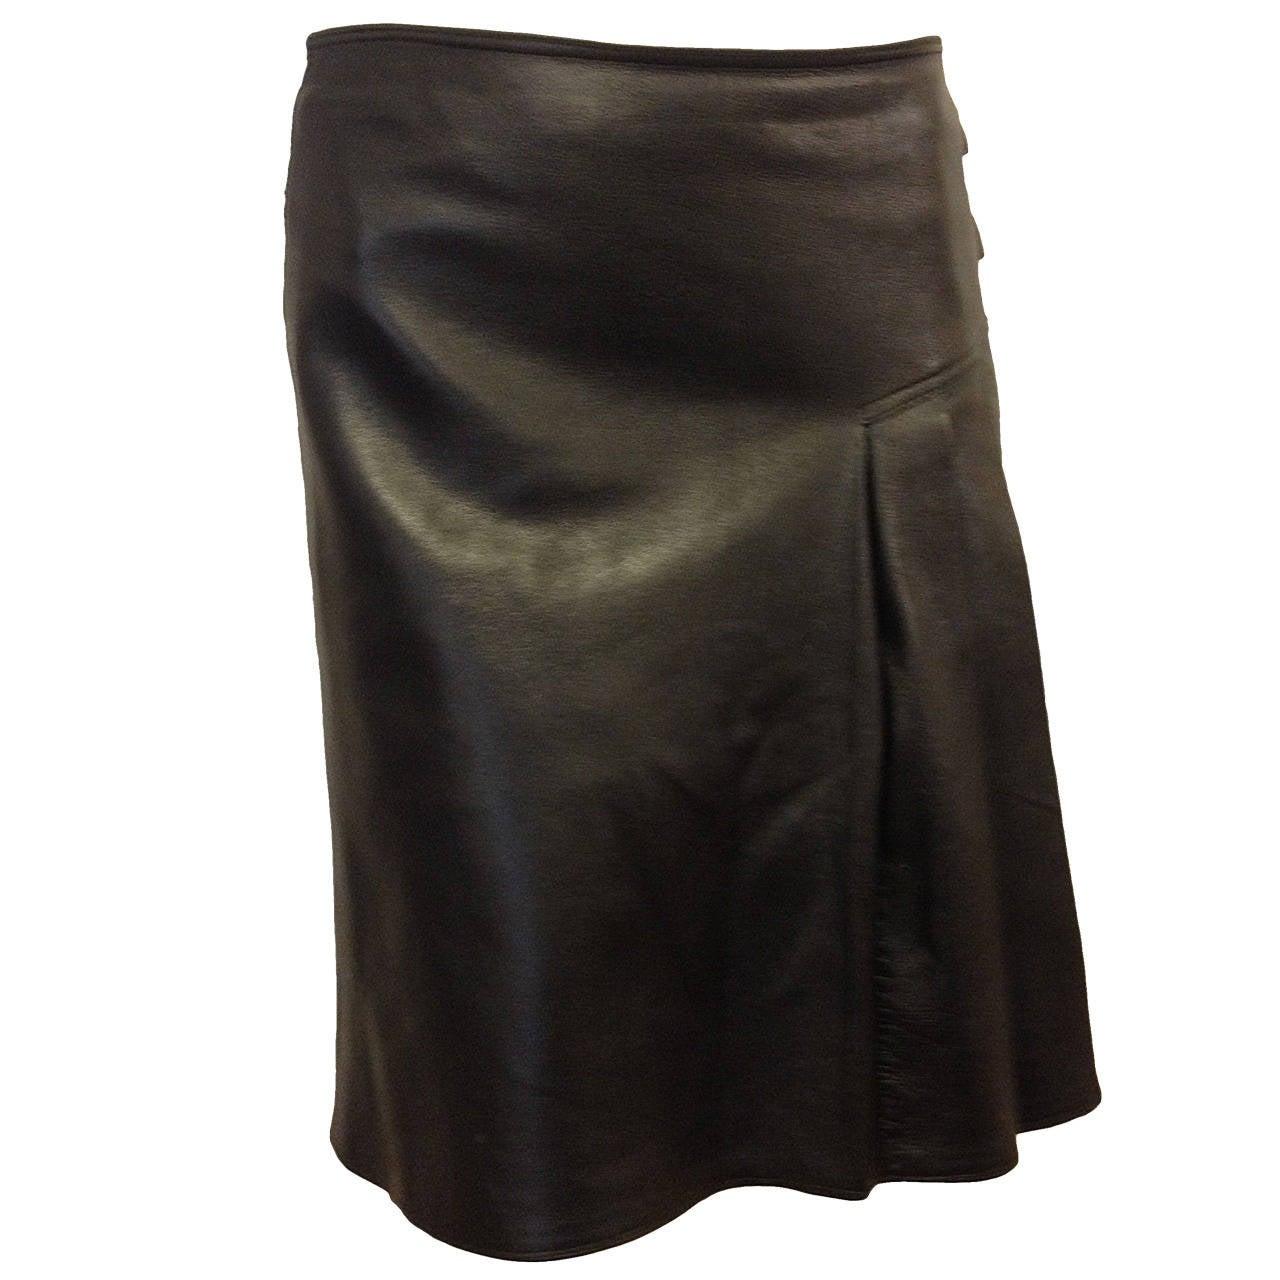 Christian Dior Black Leather Skirt